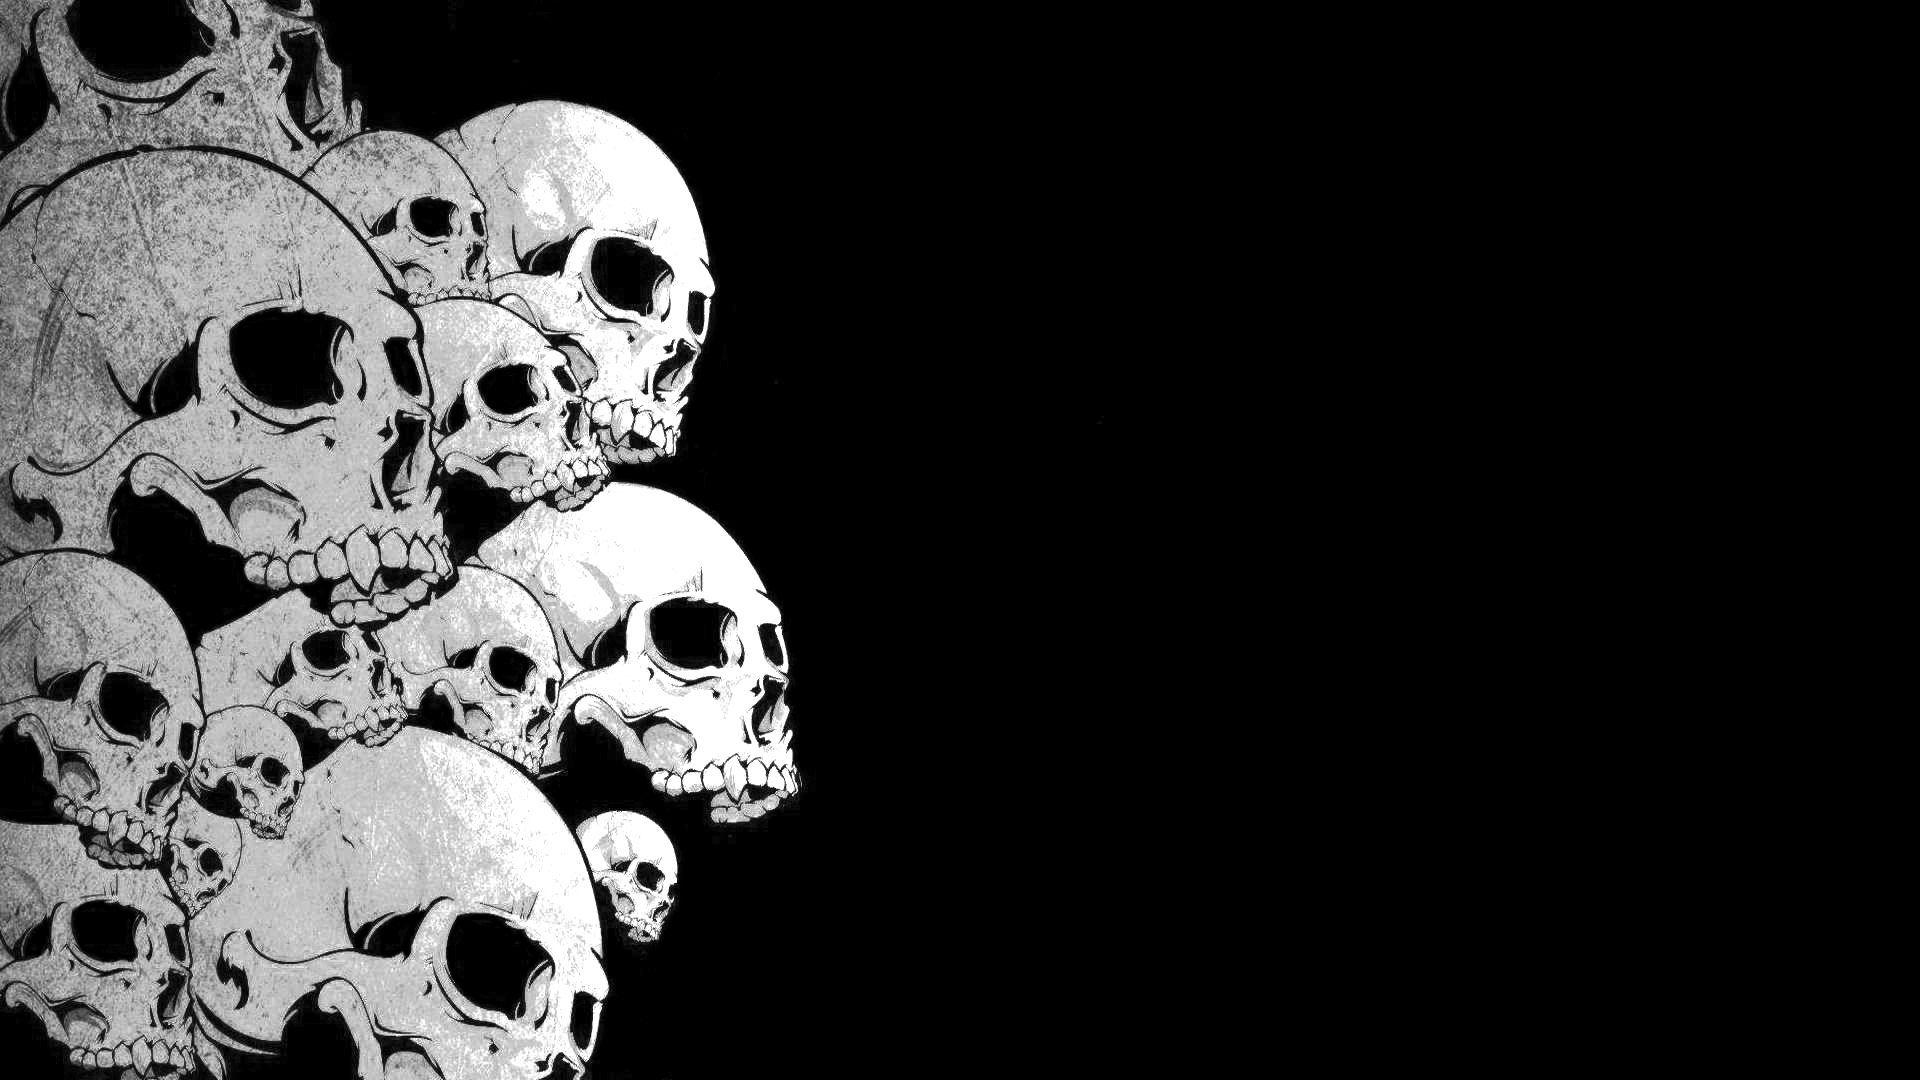 zombie skull wallpapers for desktop - photo #46